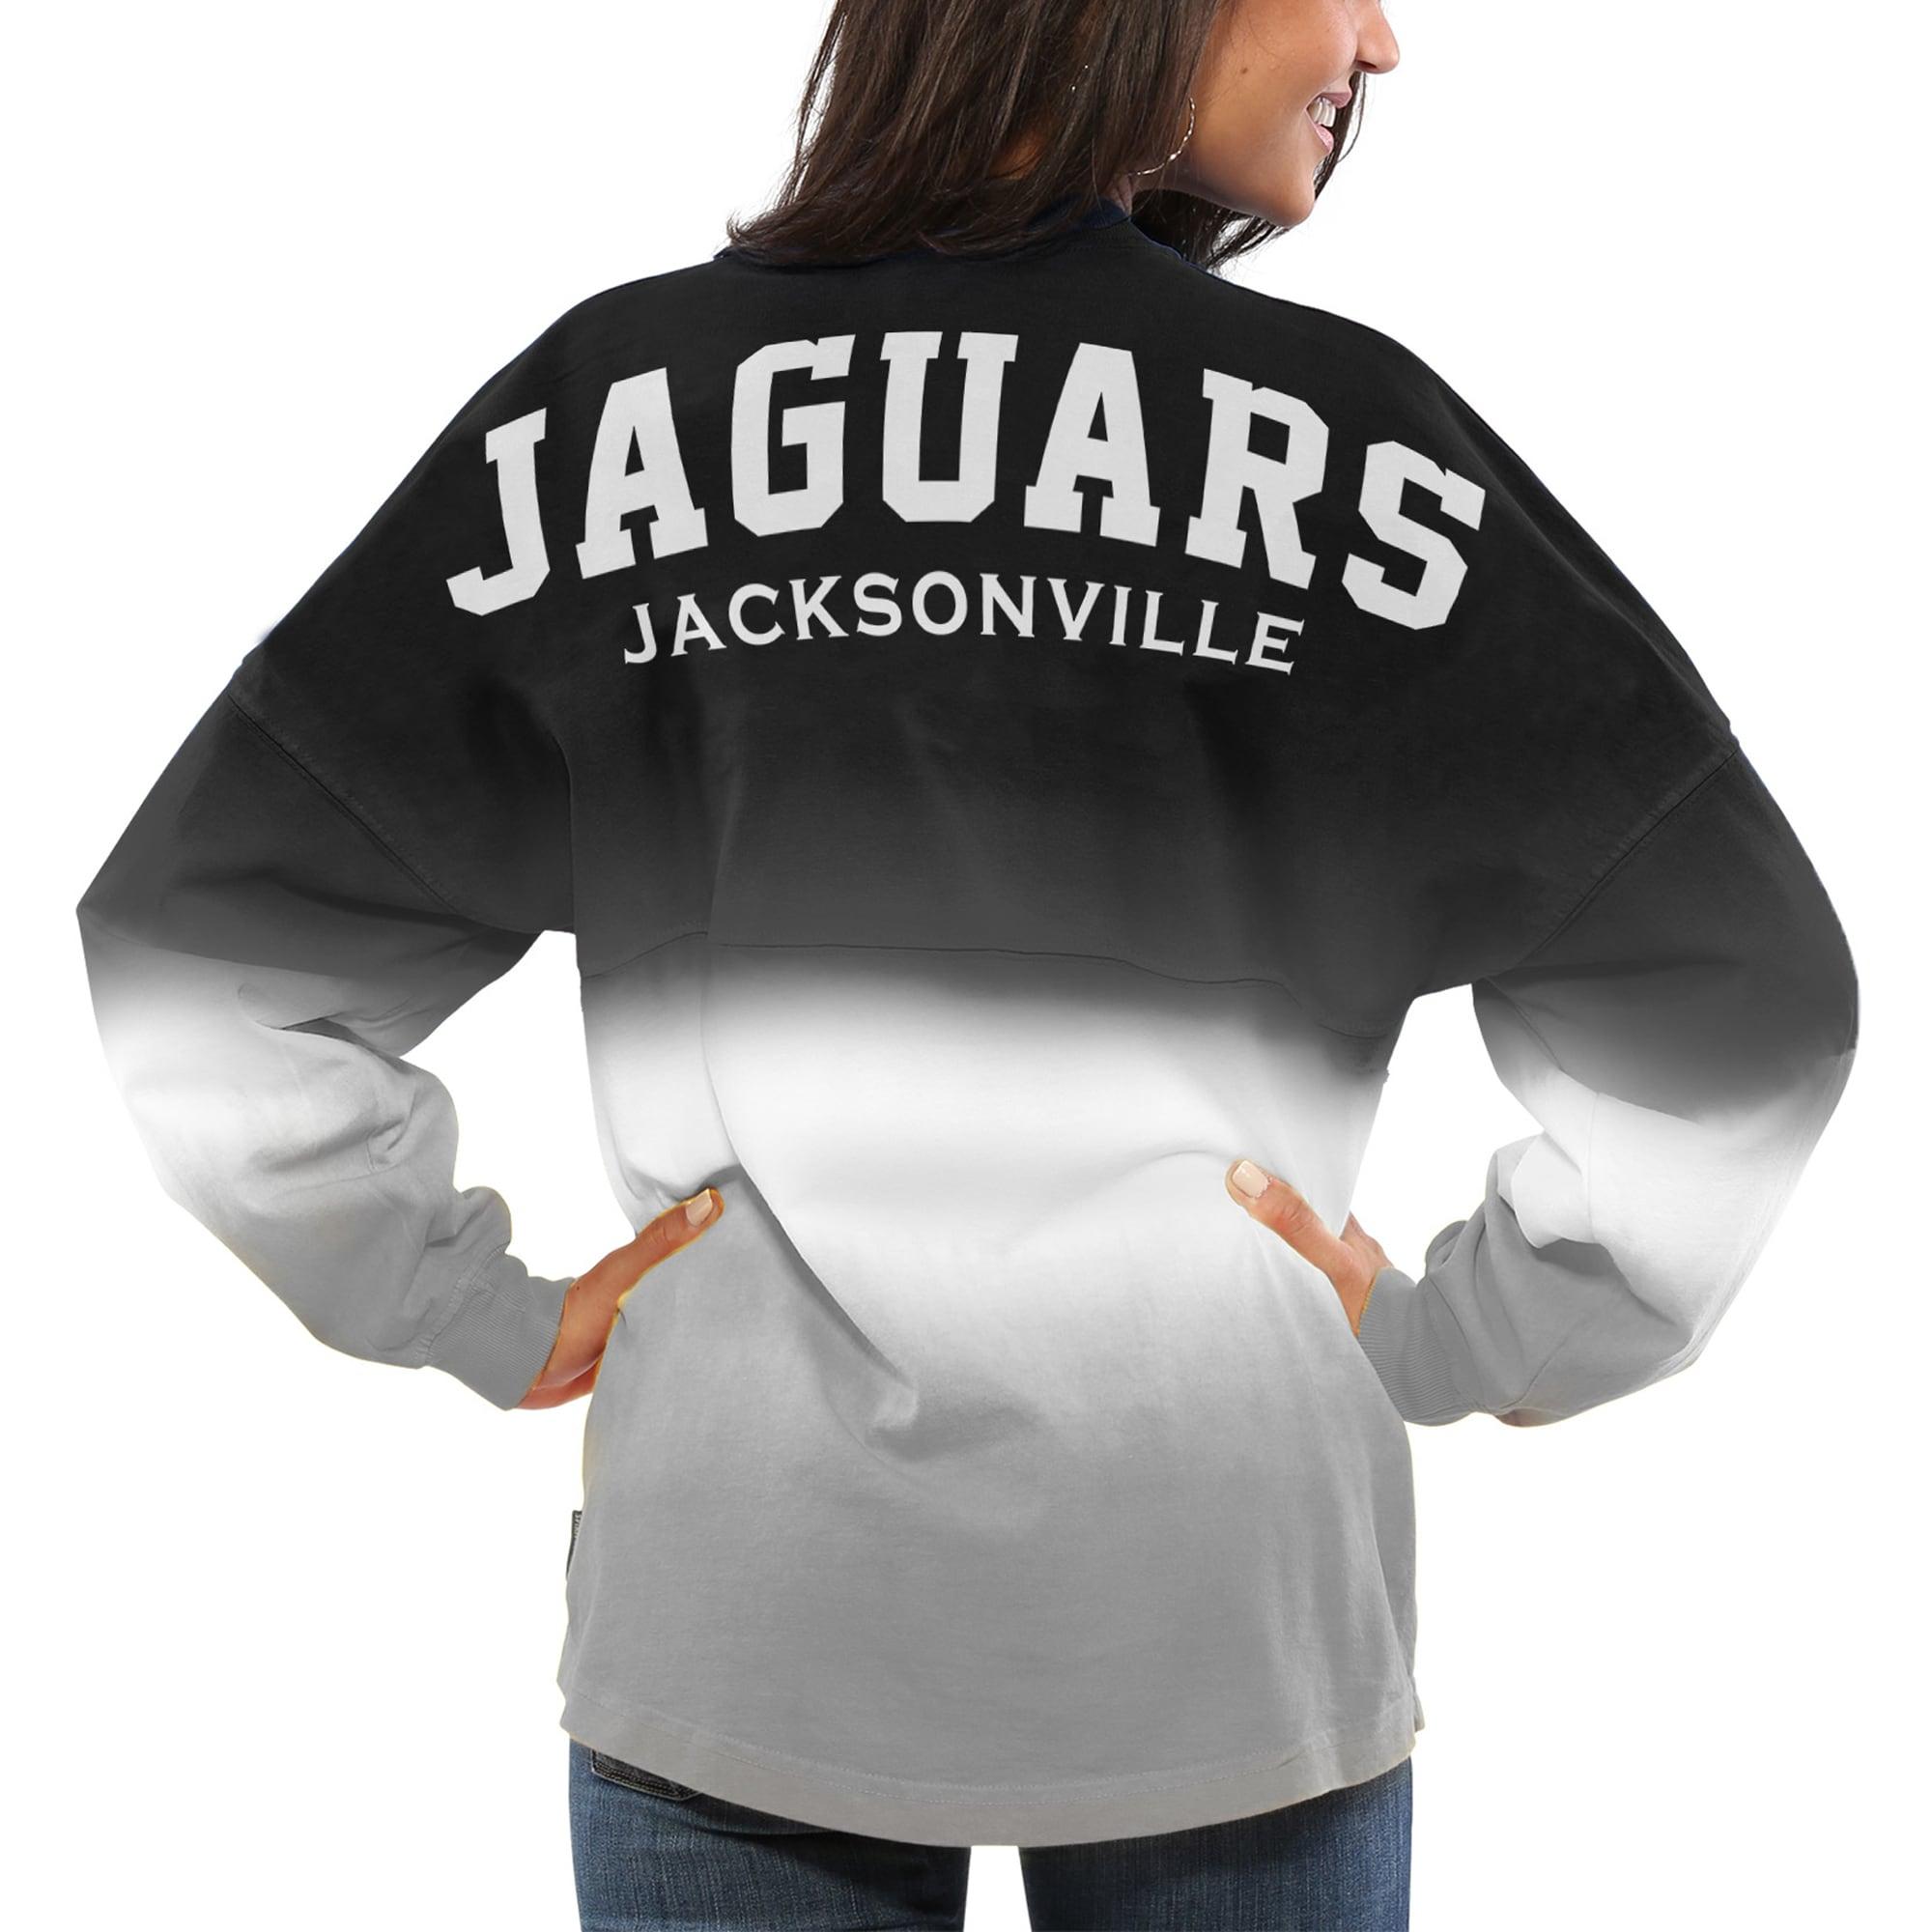 Jacksonville Jaguars NFL Pro Line by Fanatics Branded Women's Spirit Jersey Long Sleeve T-Shirt - Black/Gray